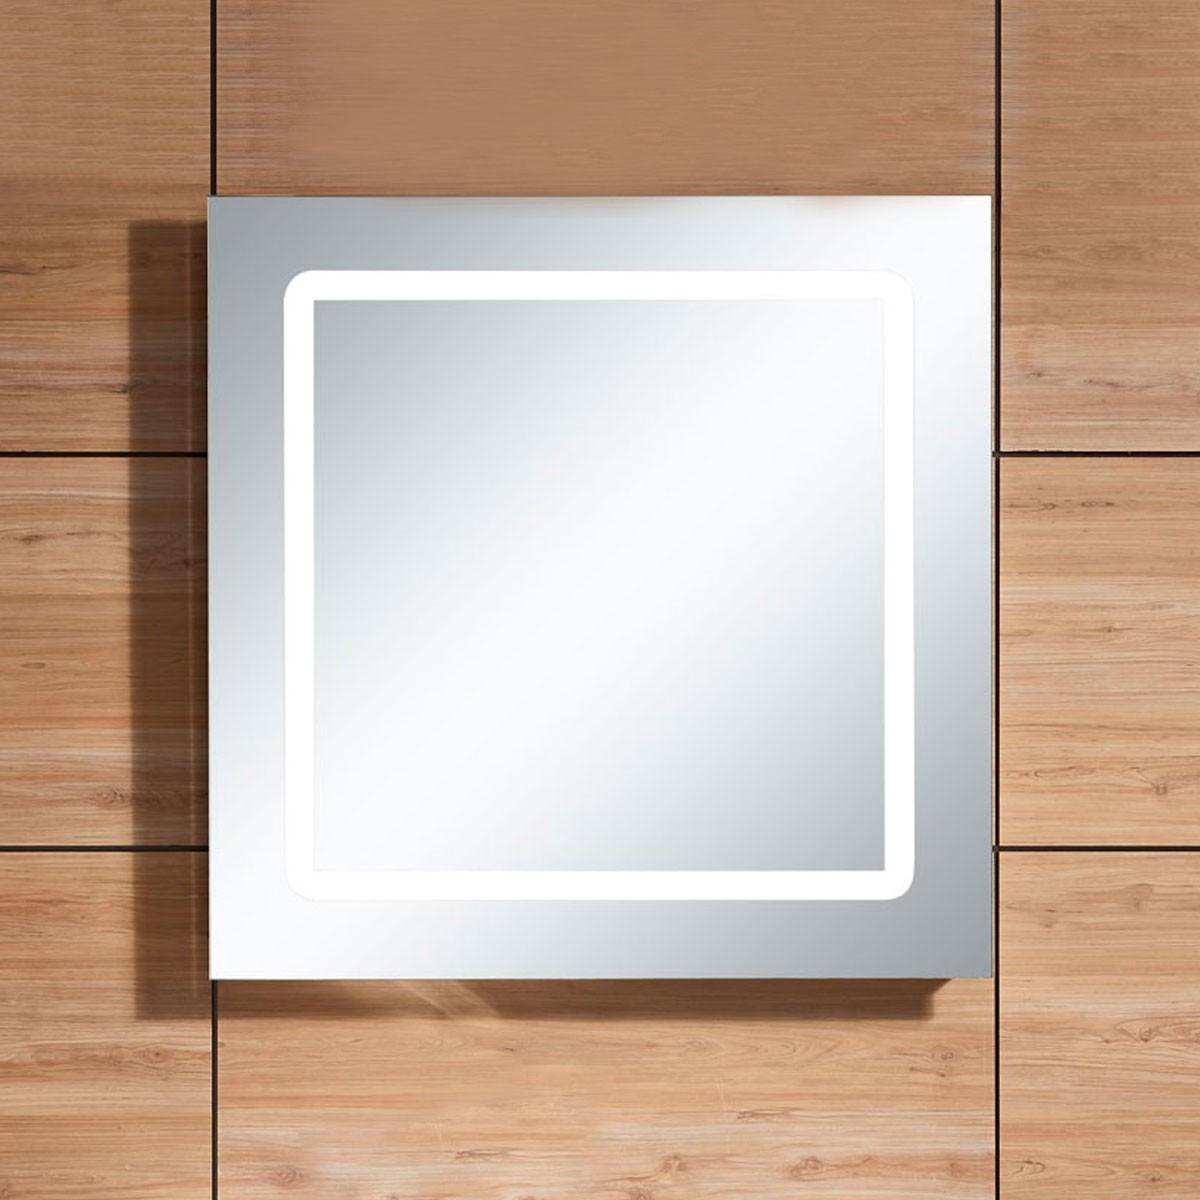 31 x 24 In. Wall Mount LED Mirror (DK-669800-M)